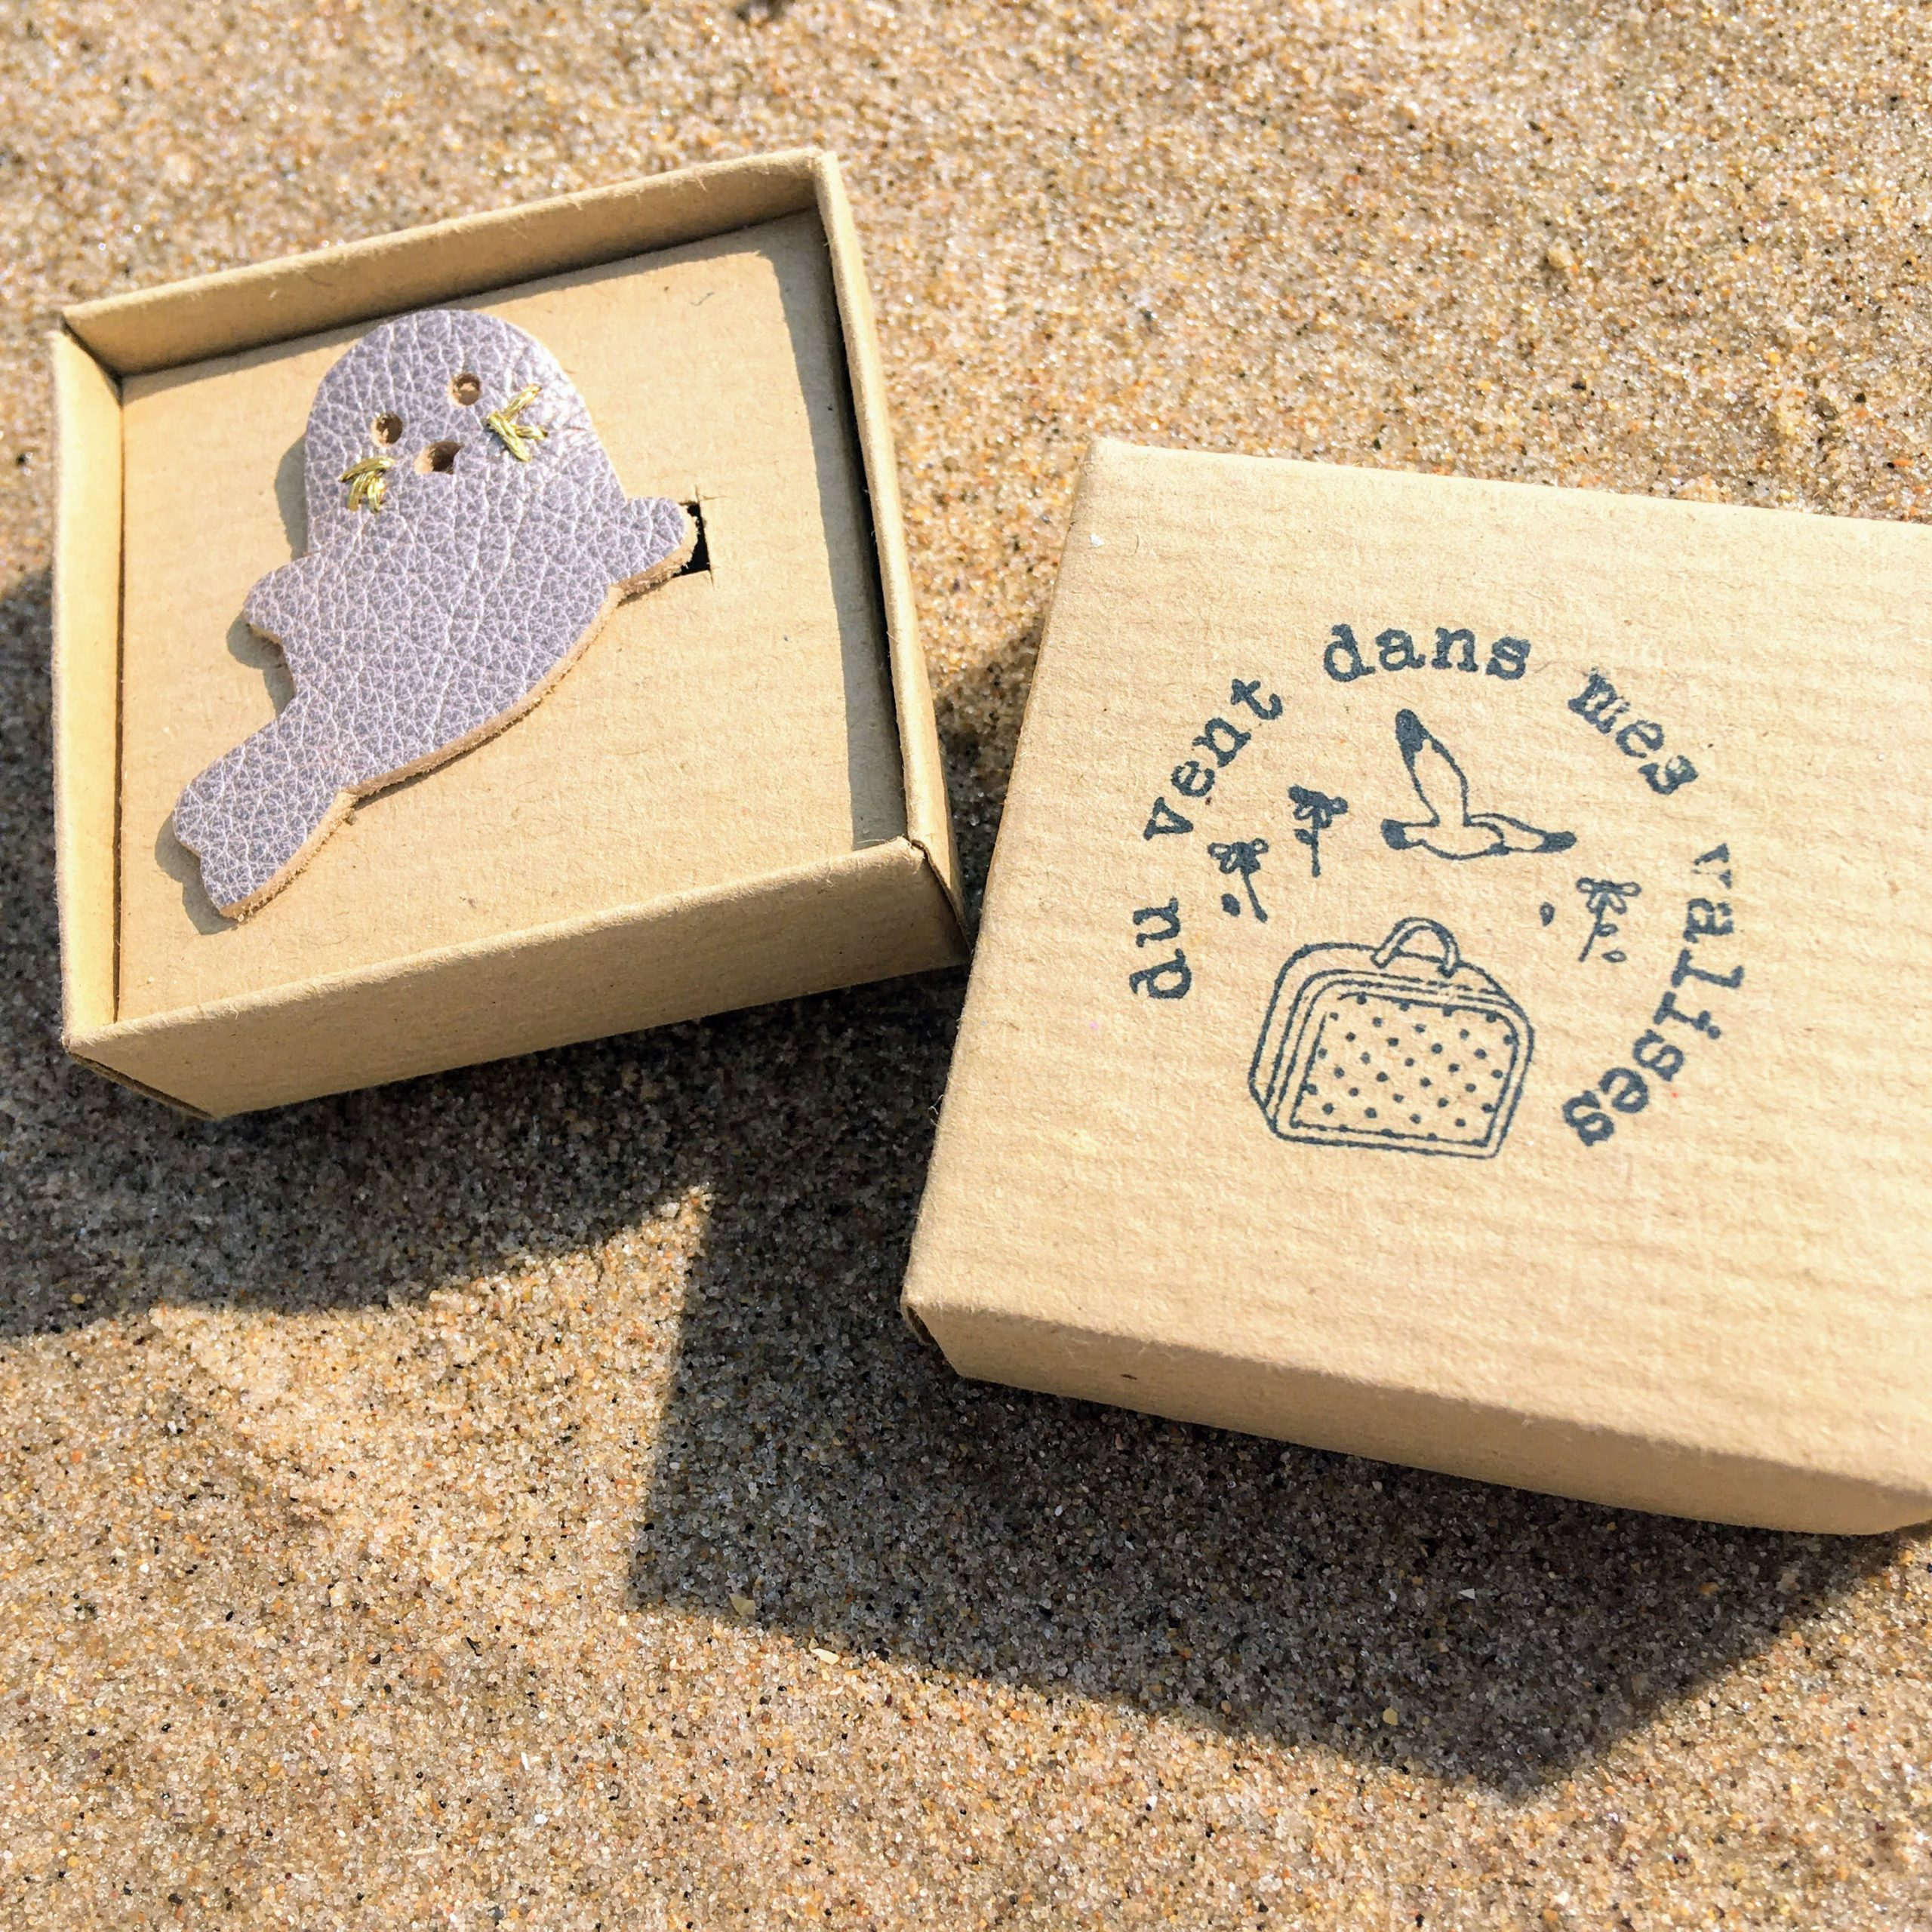 broches cuir bord de mer made in France - du vent dans mes valises